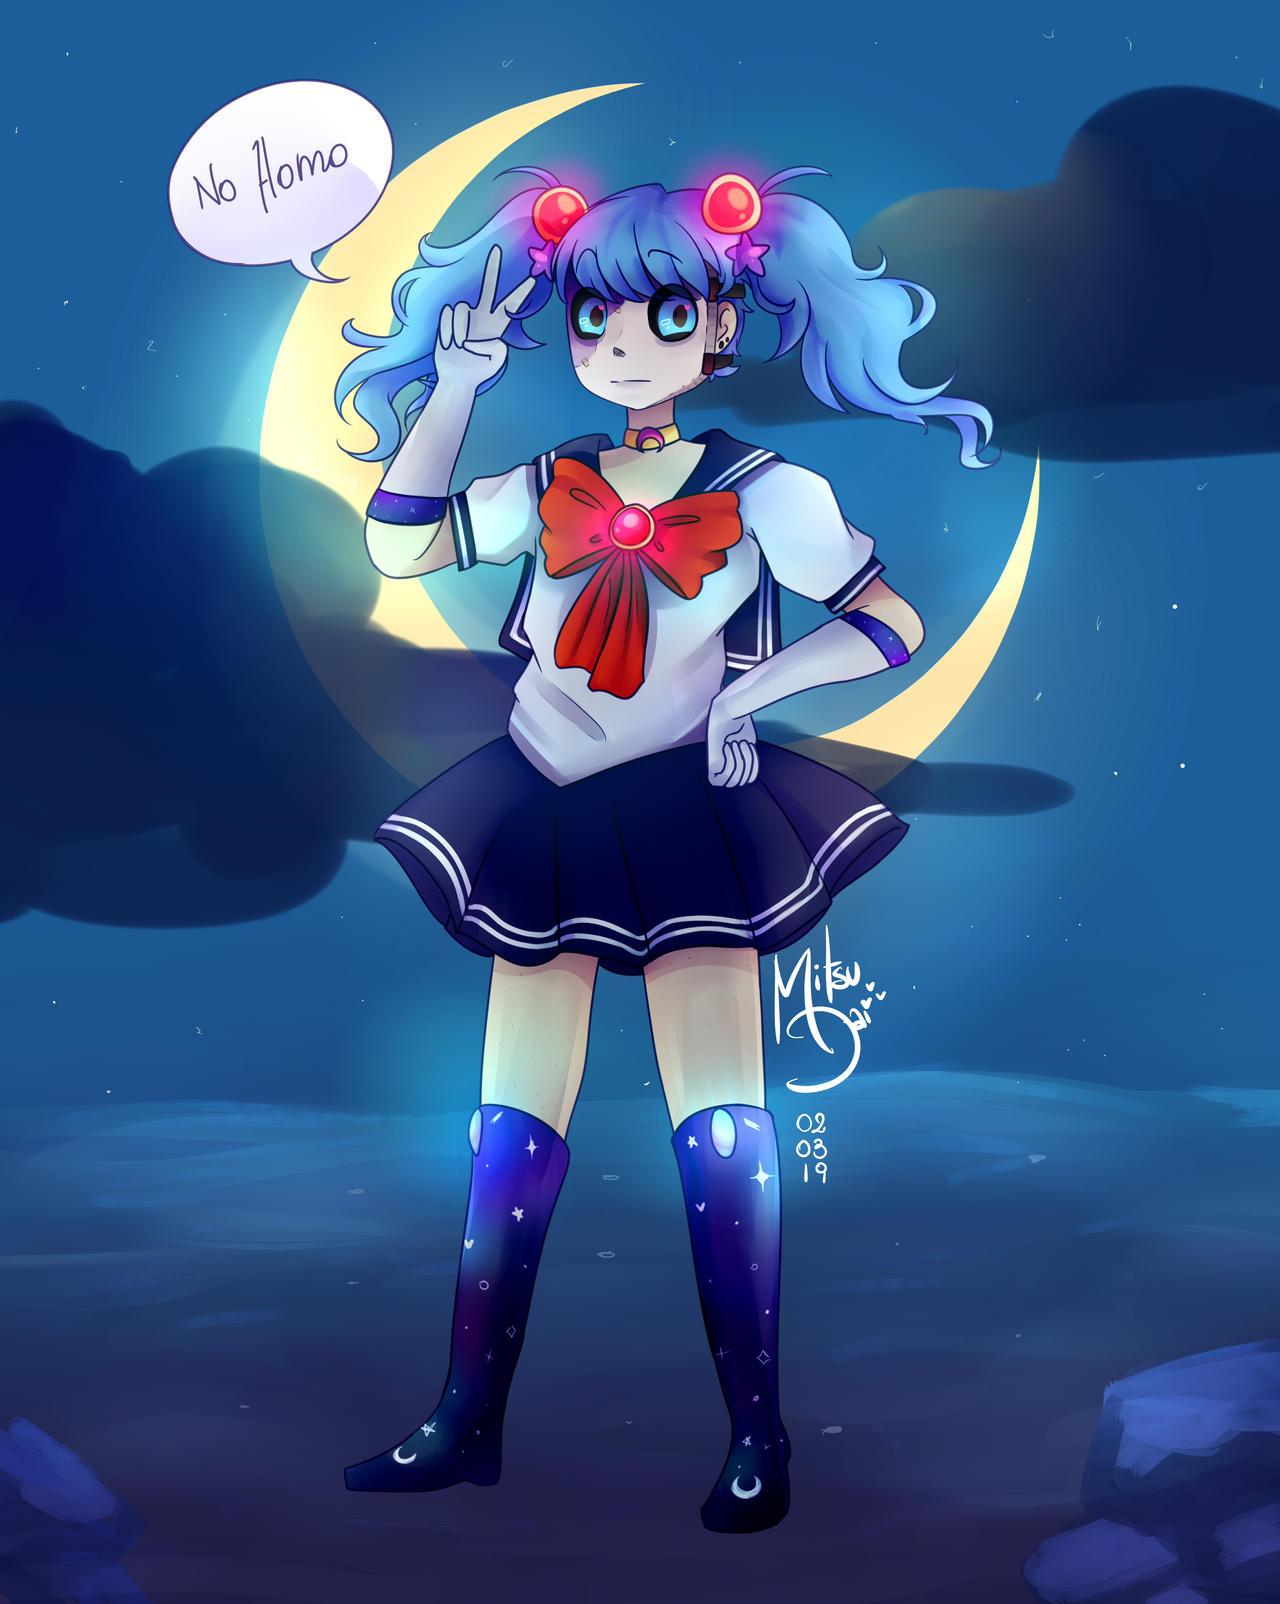 Sally Sailor Sally Face Fanart By Nishionekochan On Deviantart